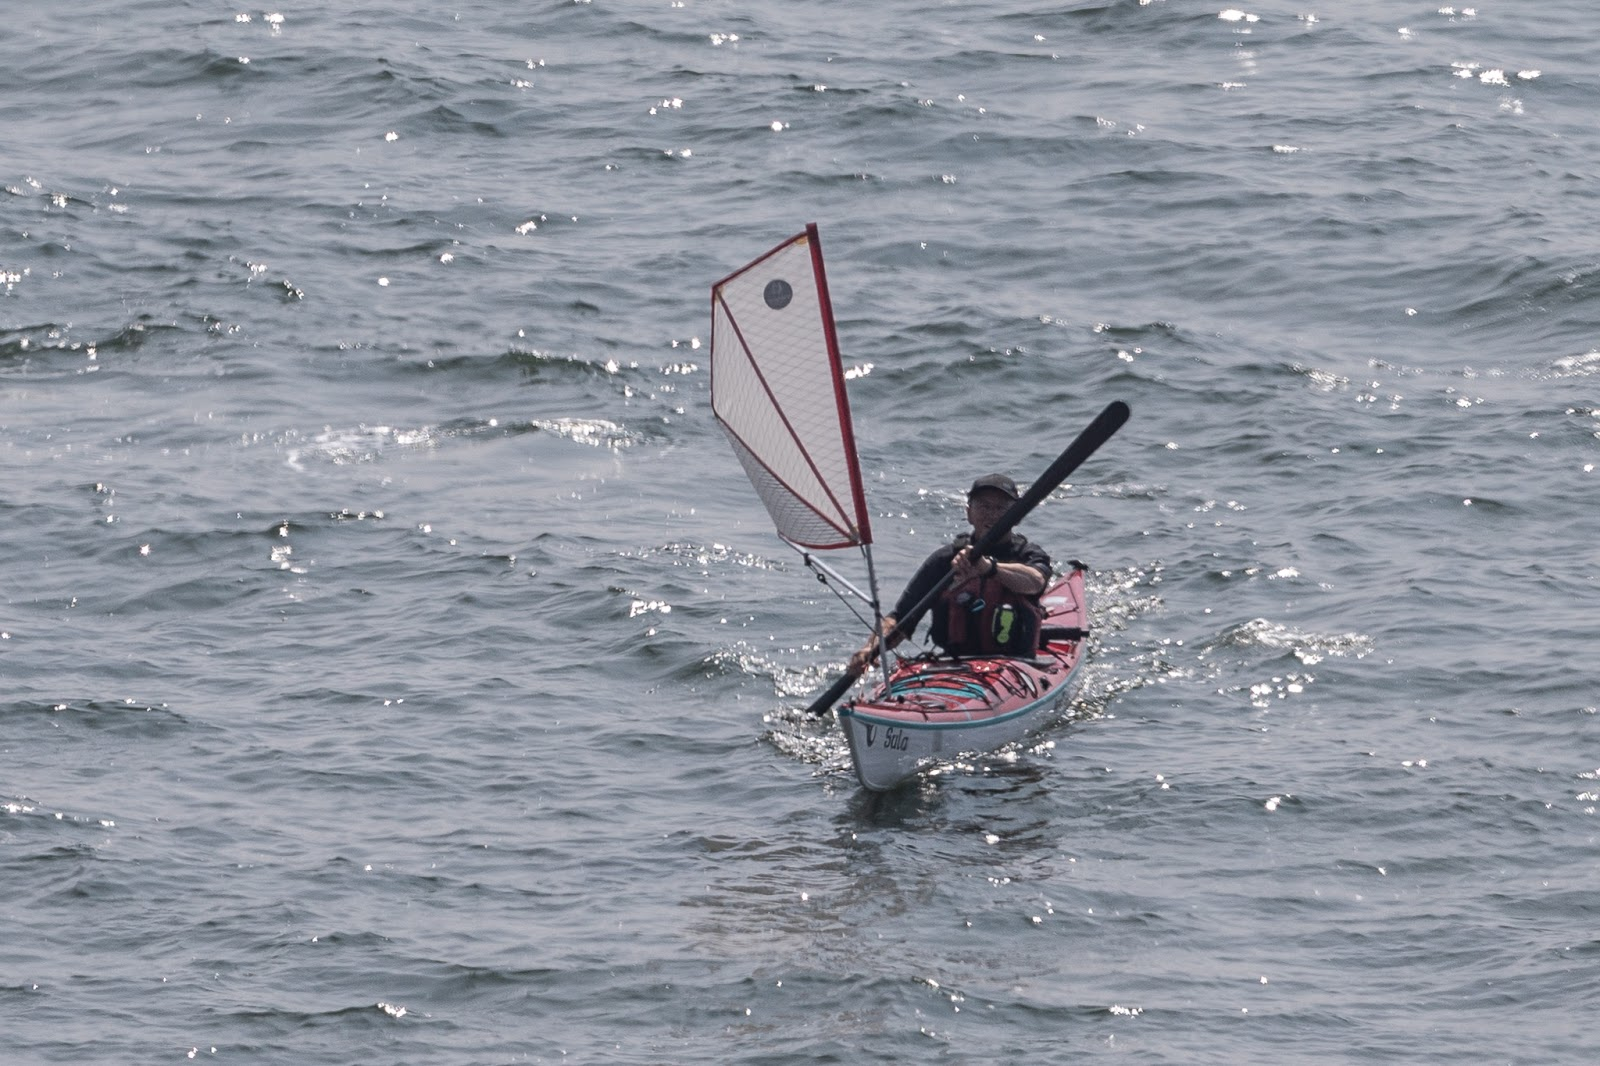 Sea kayaking with seakayakphoto com: Flat Earth Kayak Sails